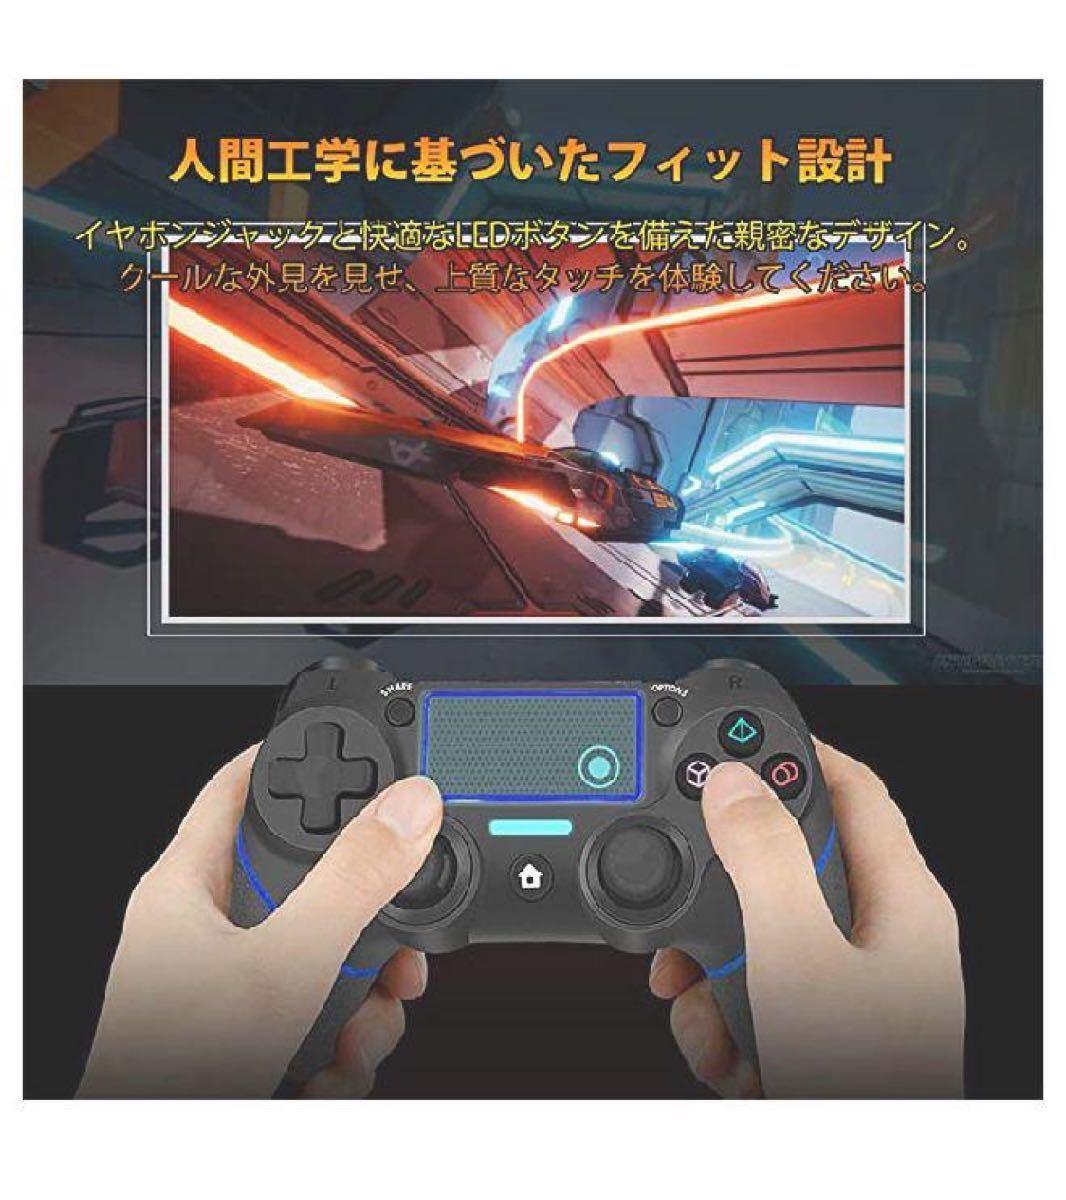 PS4コントローラー ワイヤレスコントローラー